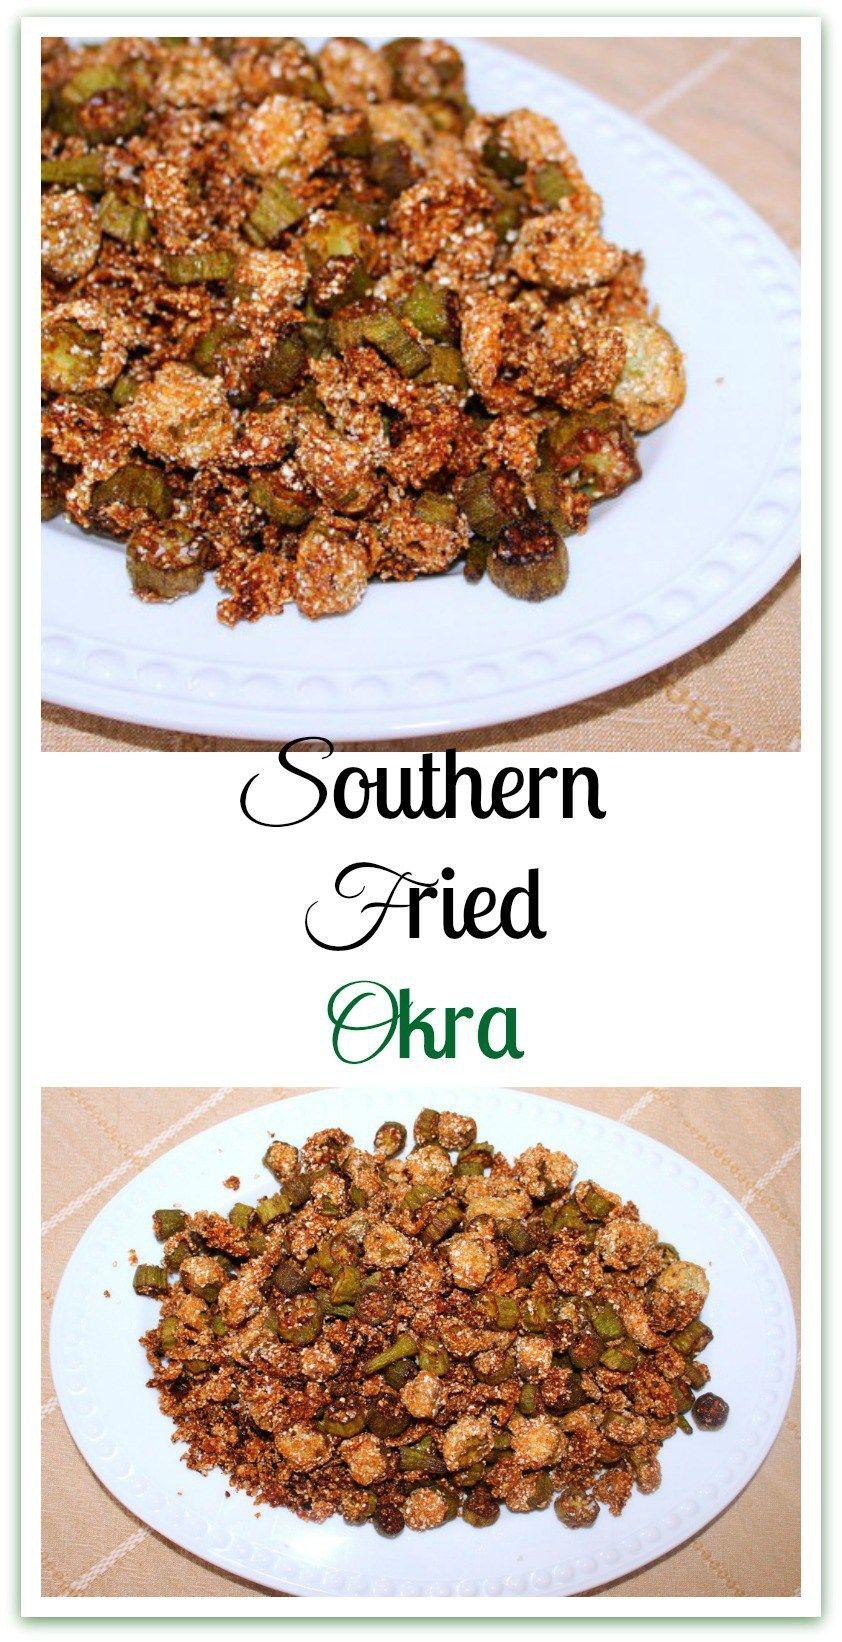 Southern Fried Okra Recipe Southern fried okra, Okra